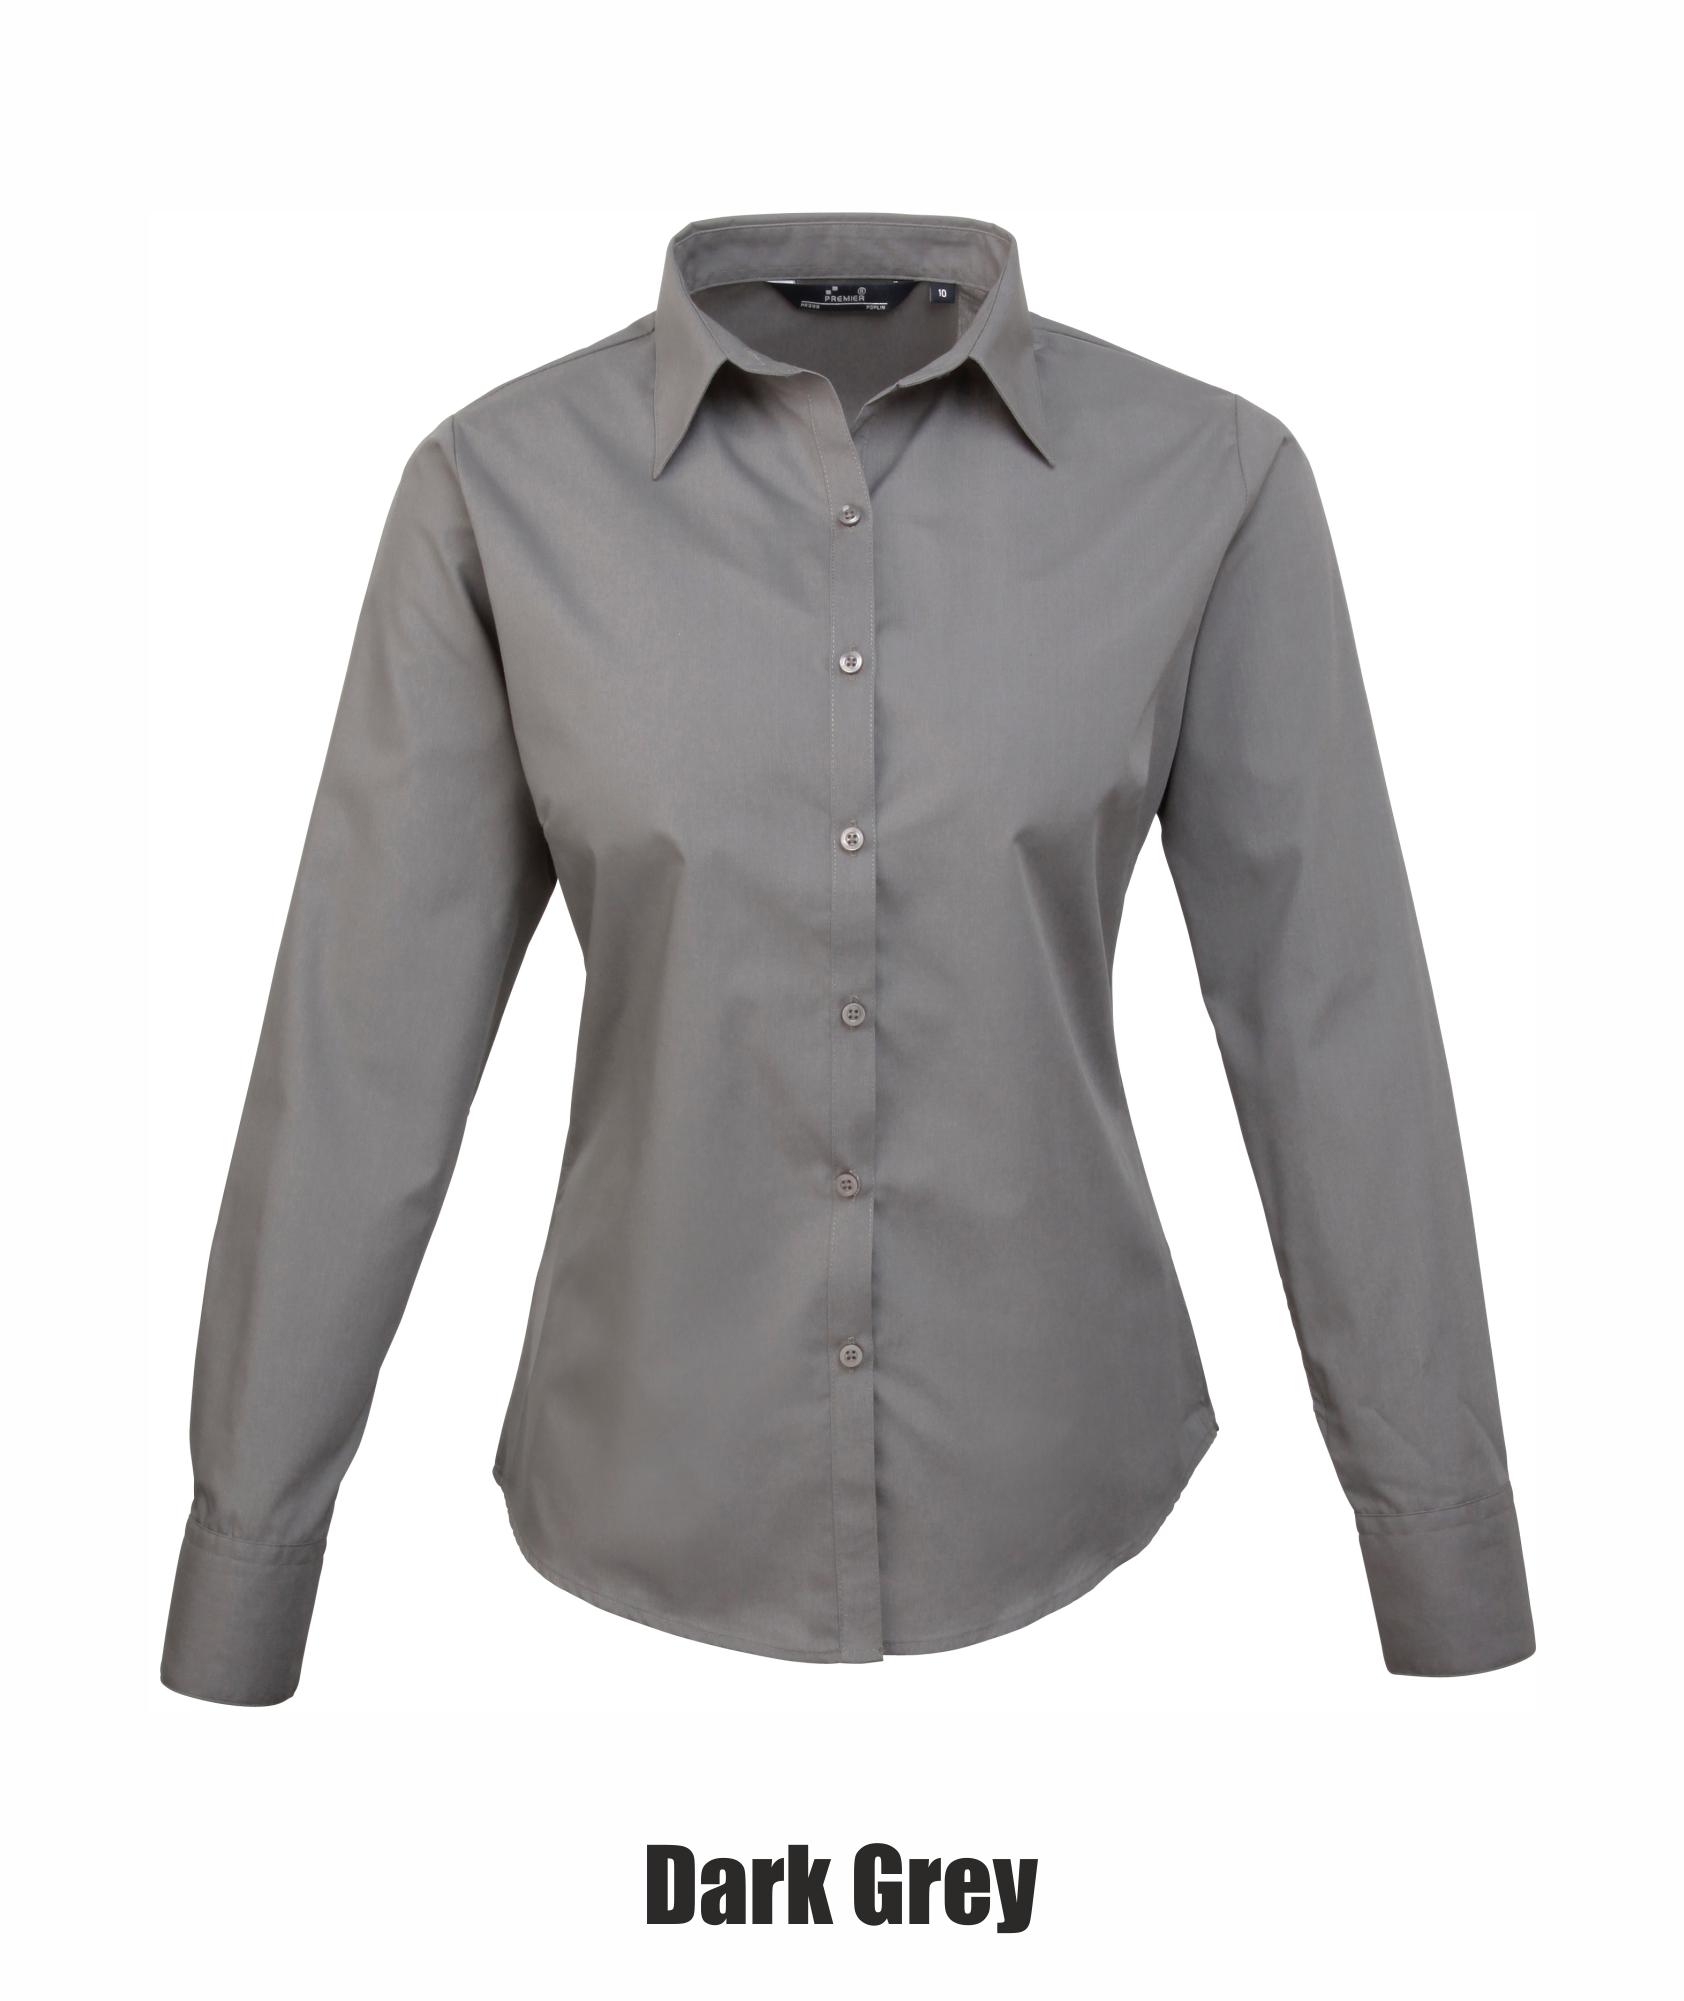 Ladies Plain Work Shirt-Lilac-Size 8 Womens poplin long sleeve blouse